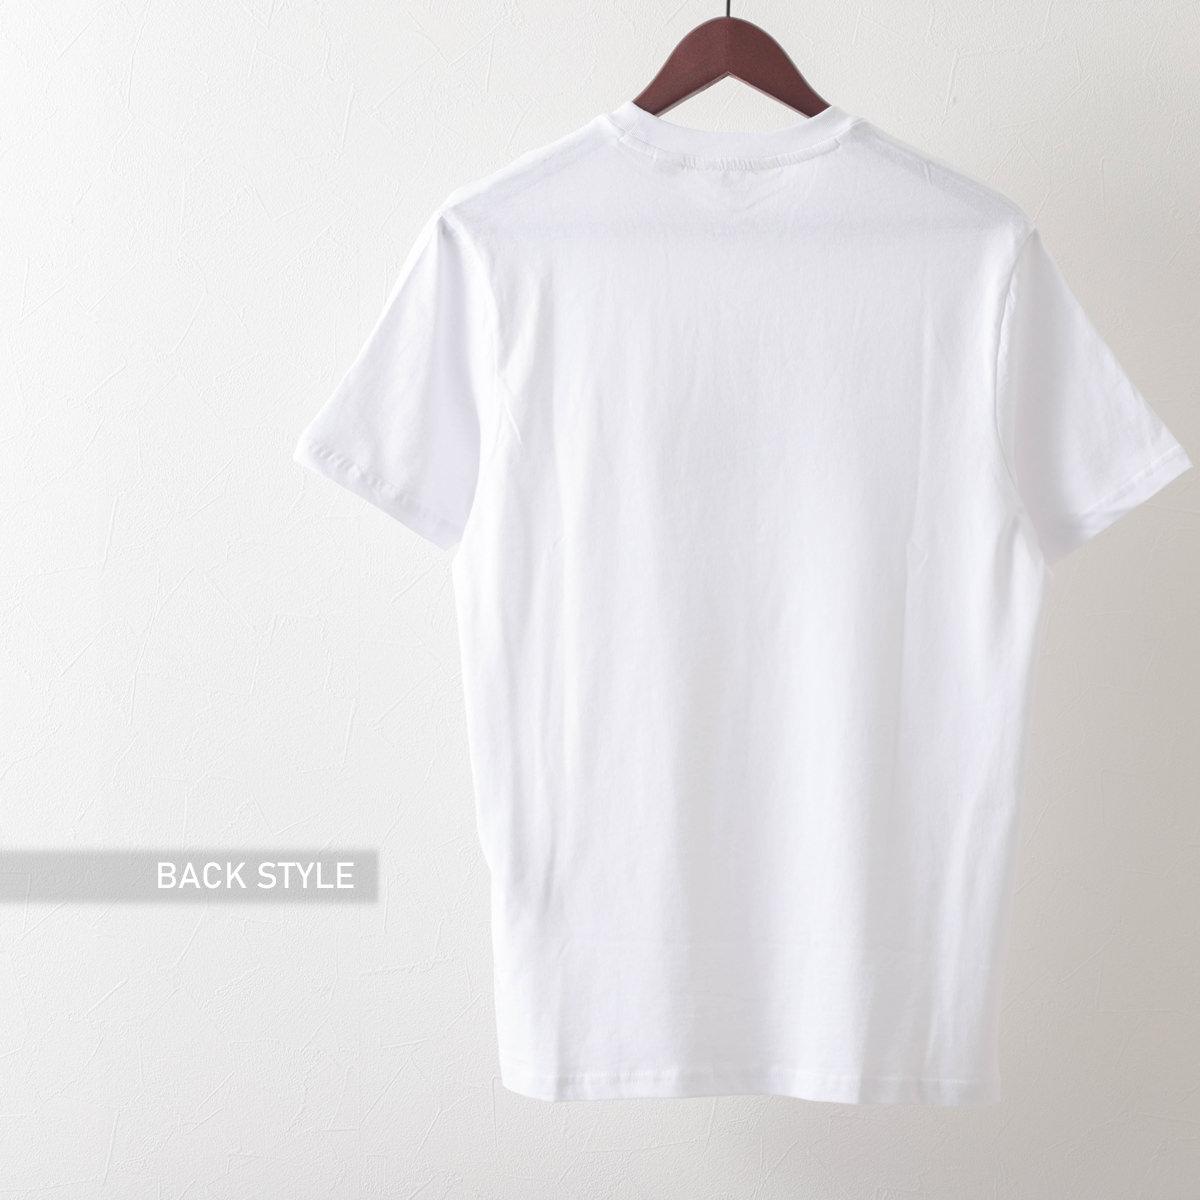 Ben Sherman ベンシャーマン メンズ Tシャツ バナナスプリットプリント 2色 マリン ホワイト オーガニックコットン レギュラーフィット